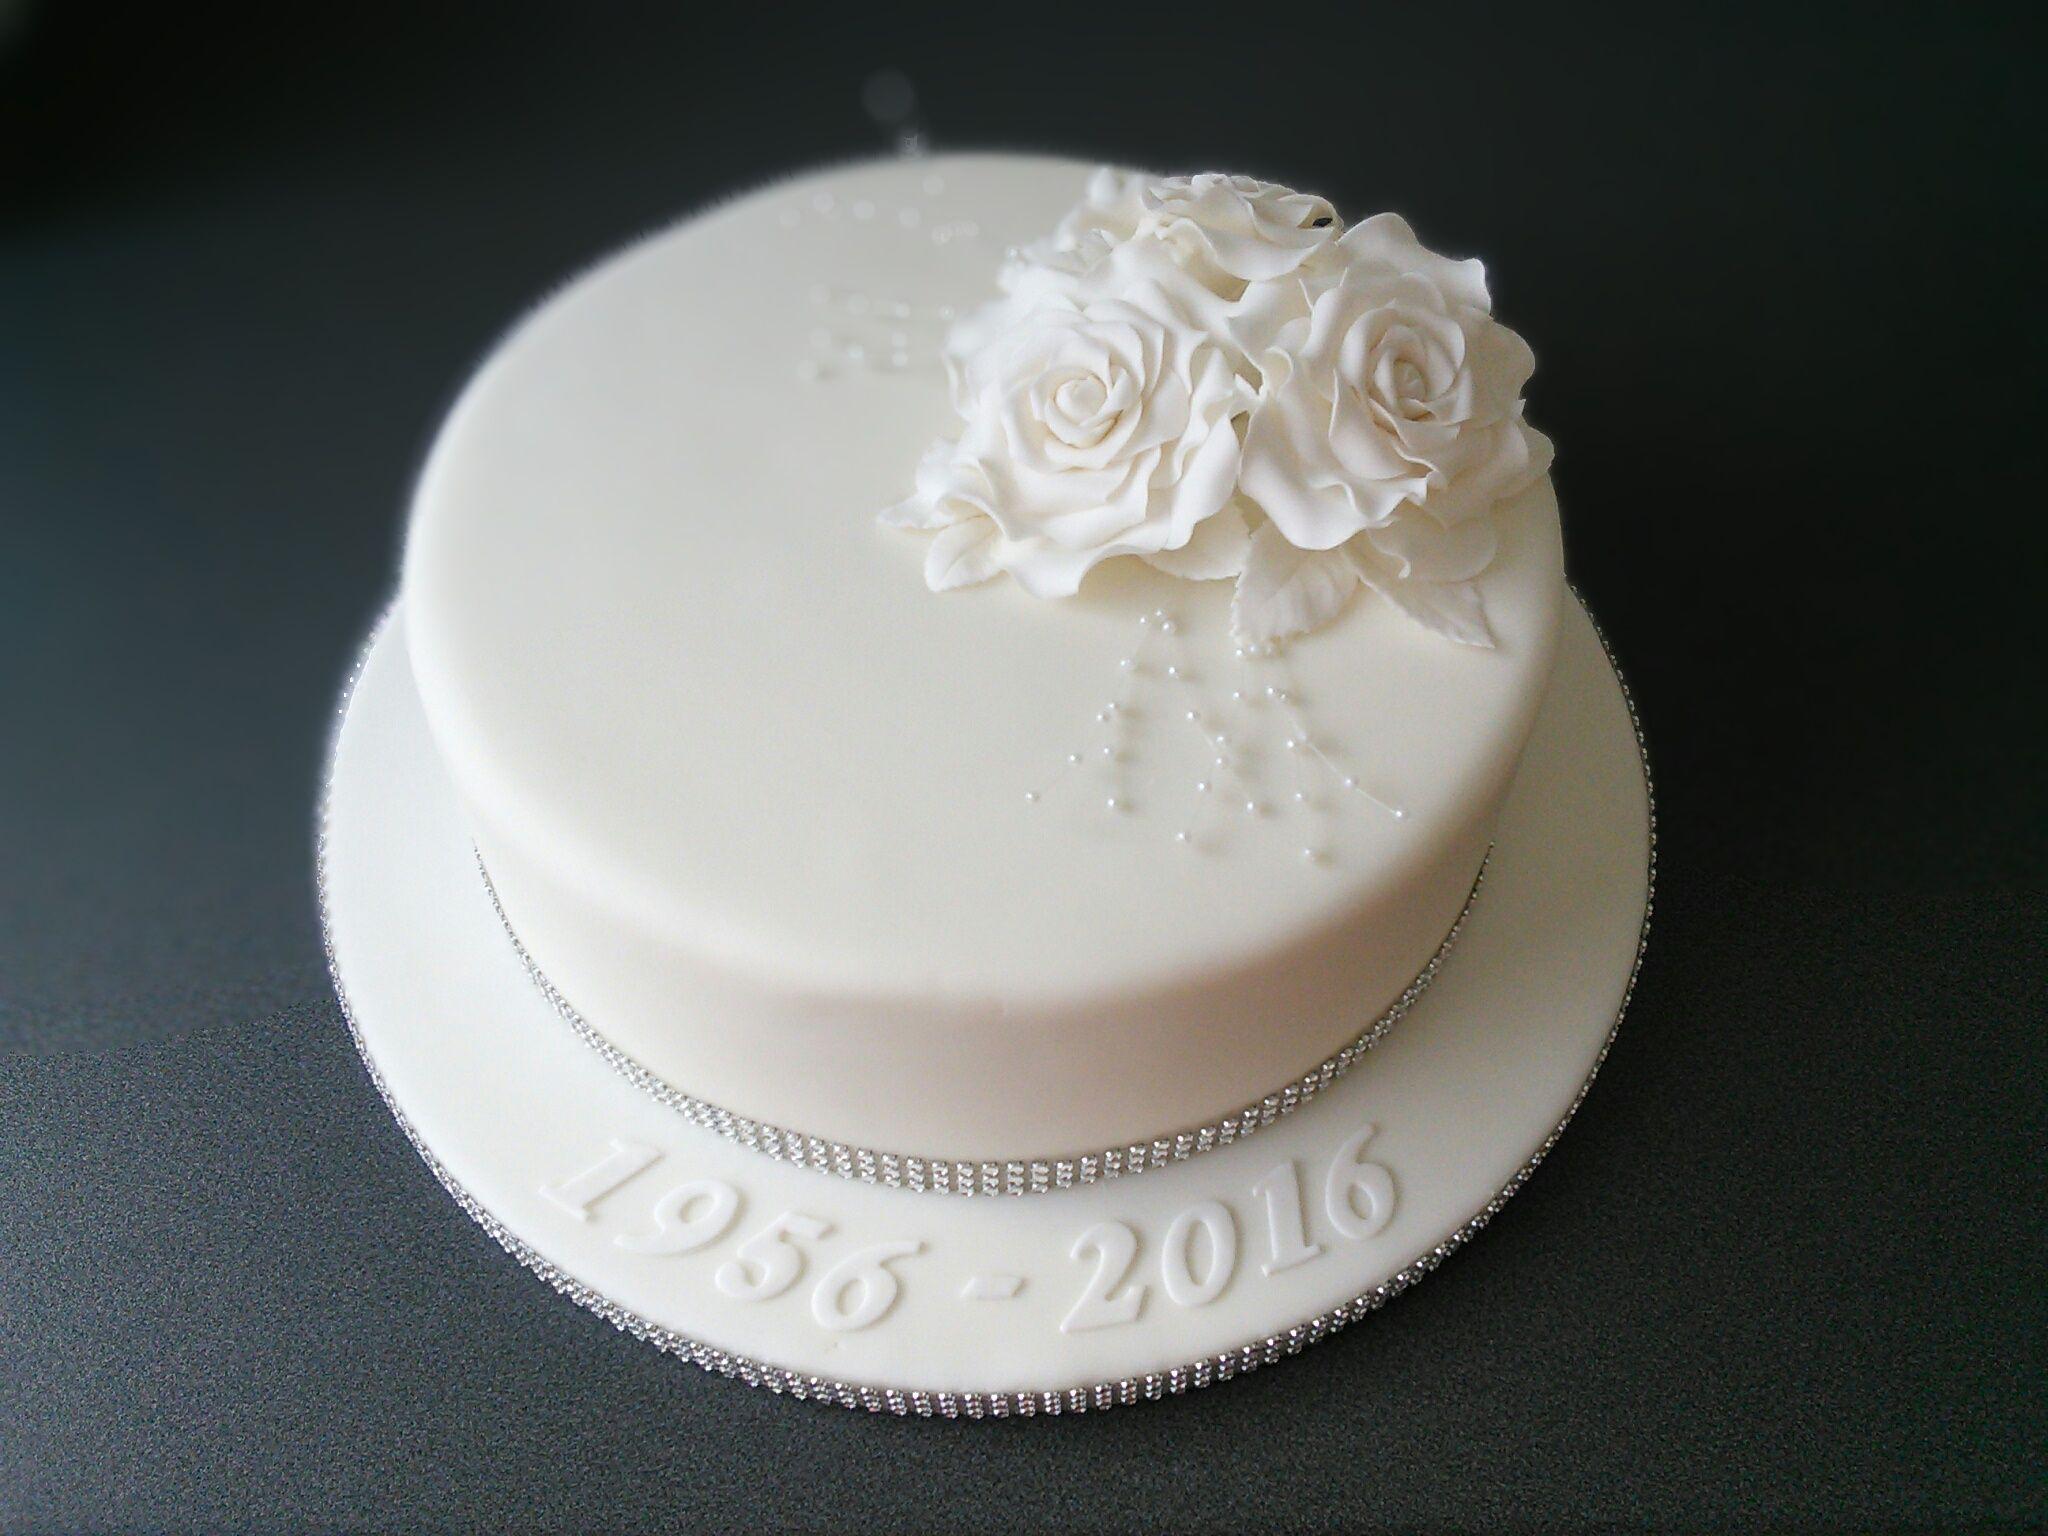 Diamond Wedding Anniversary cake with white roses and diamante ...